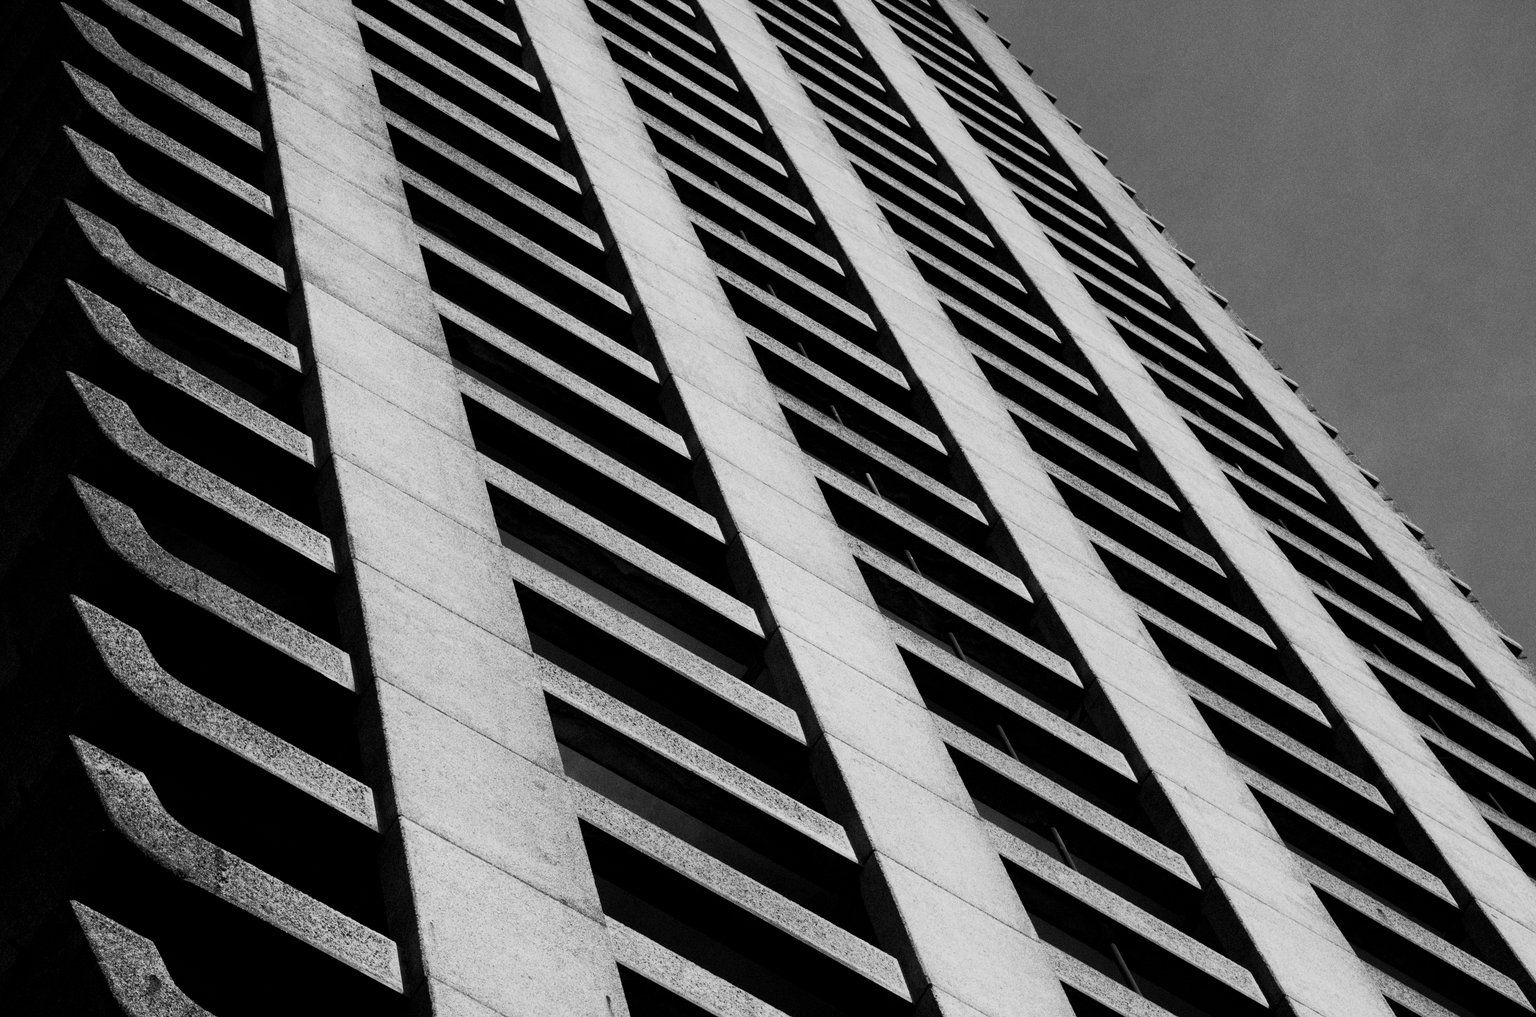 Urban Geometry By Charles Brabin